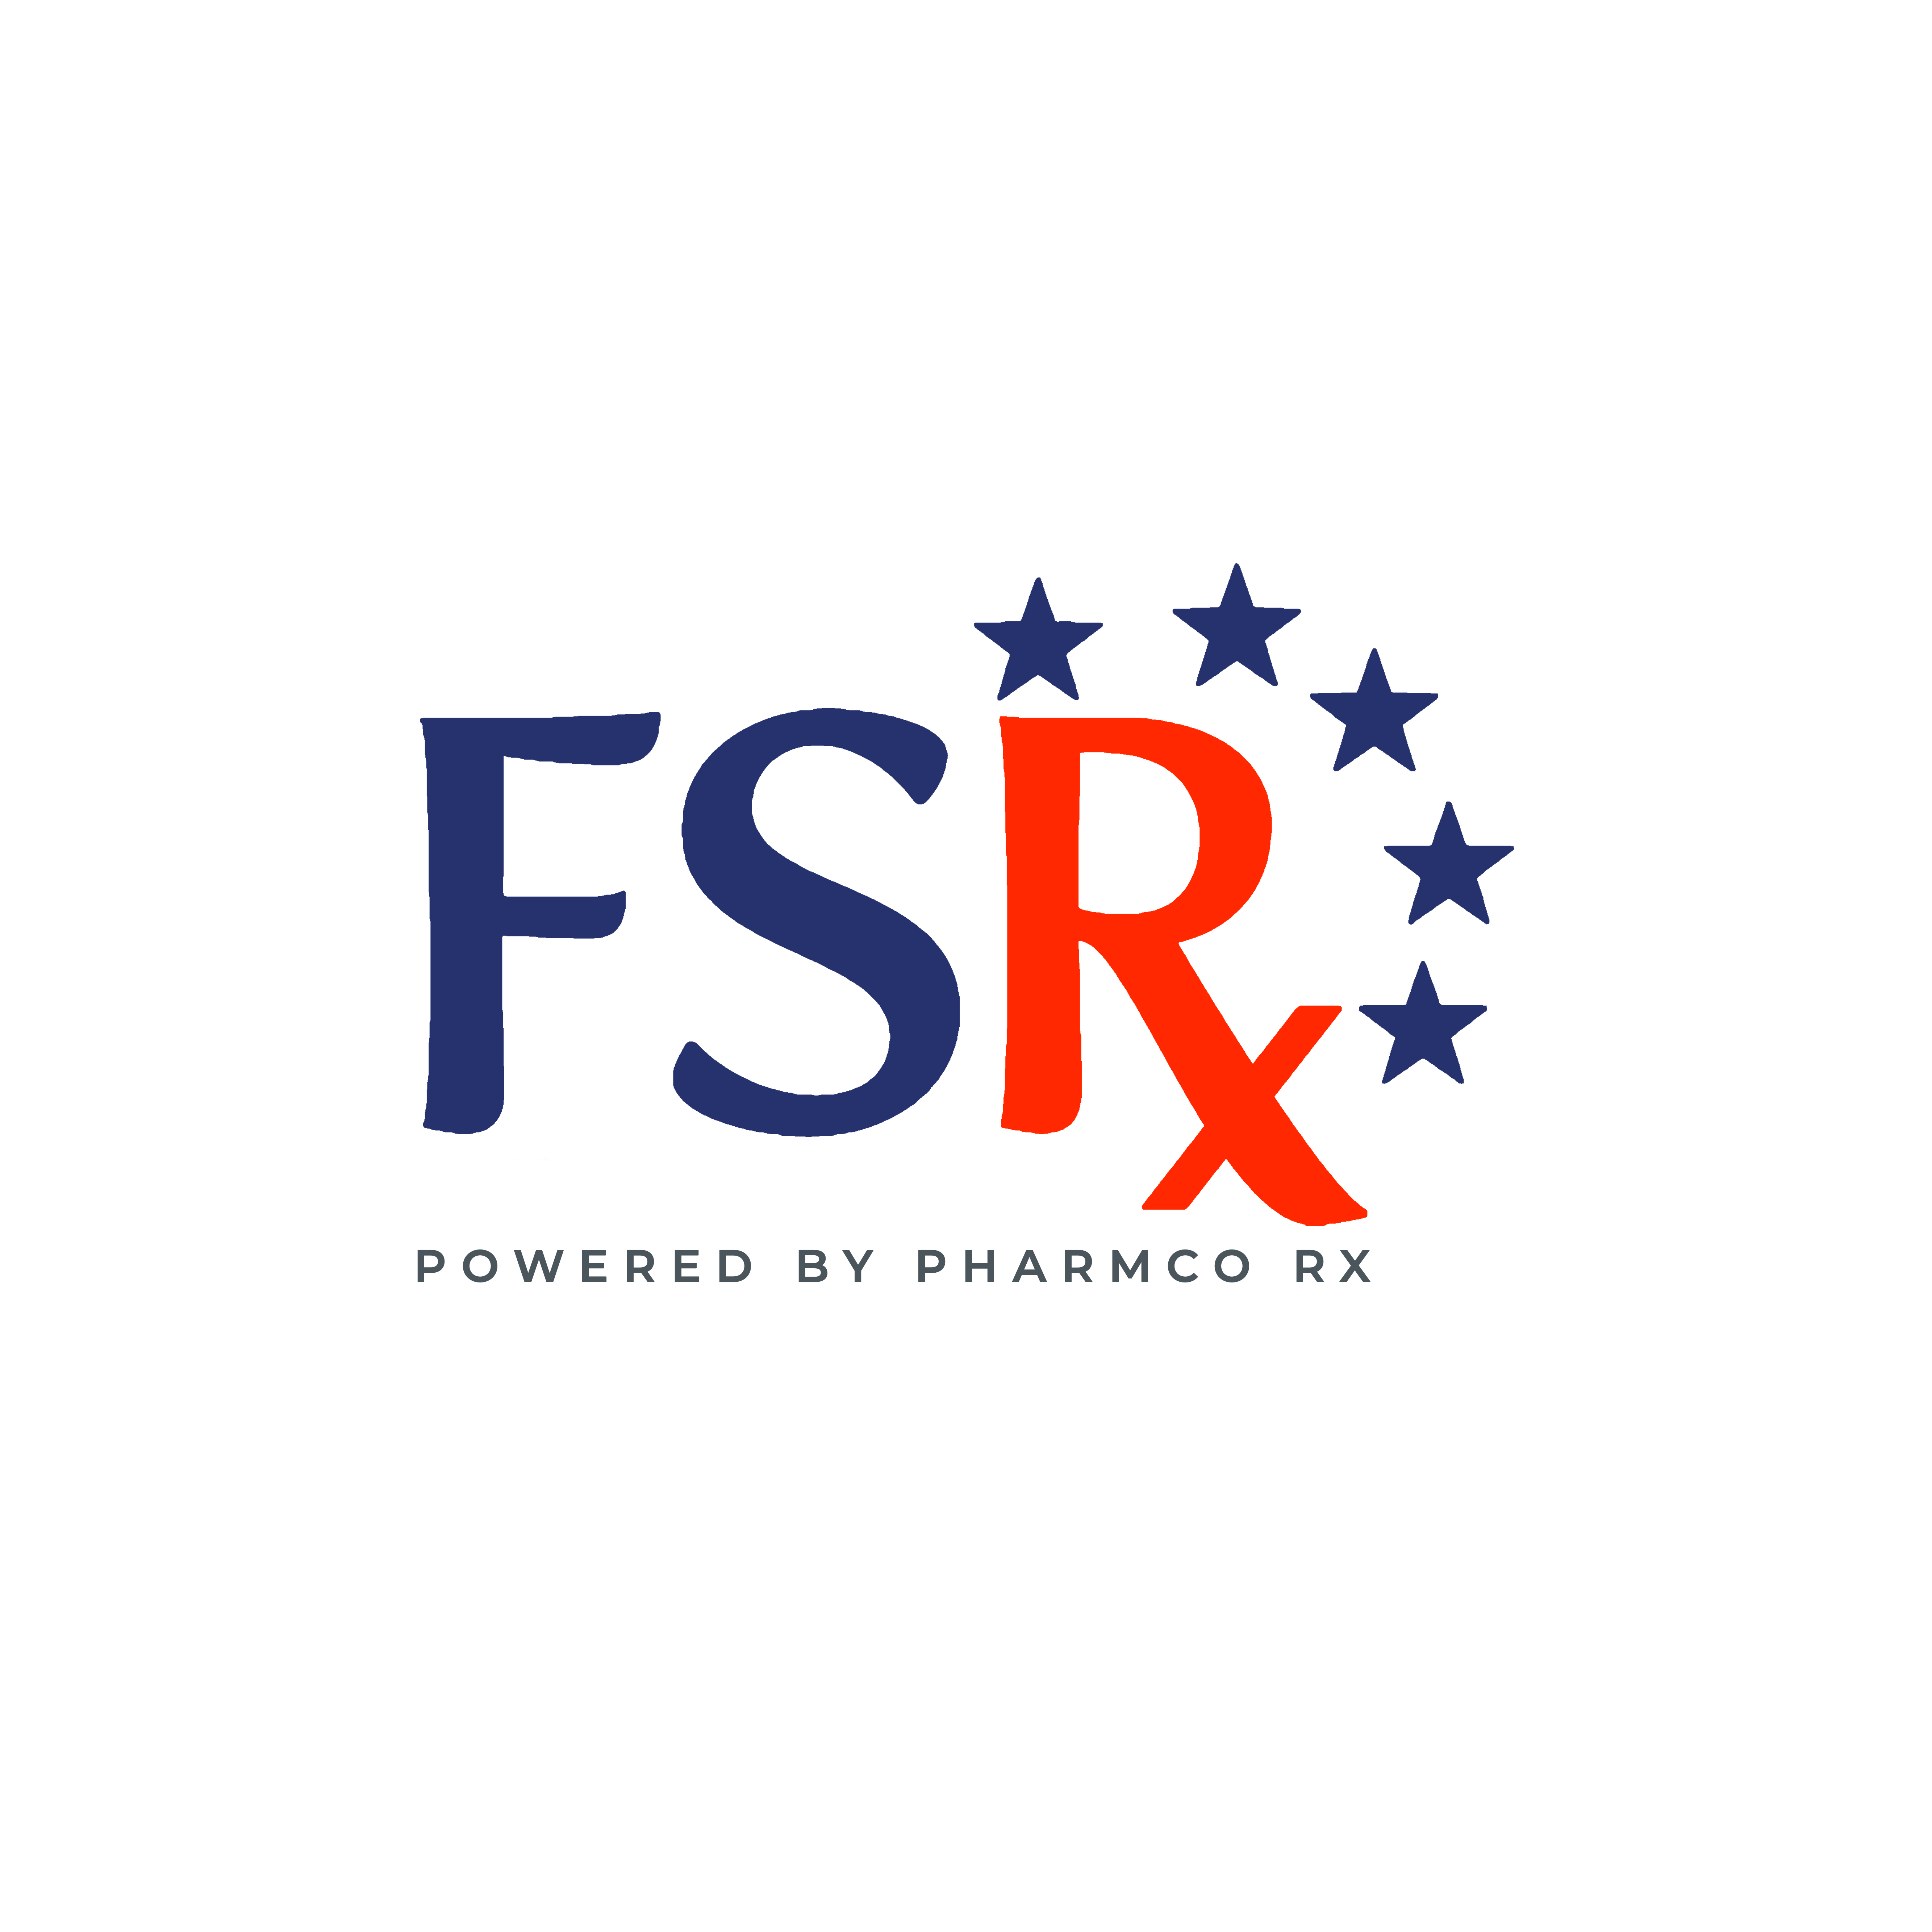 five-star-rx-pharmacy-logo